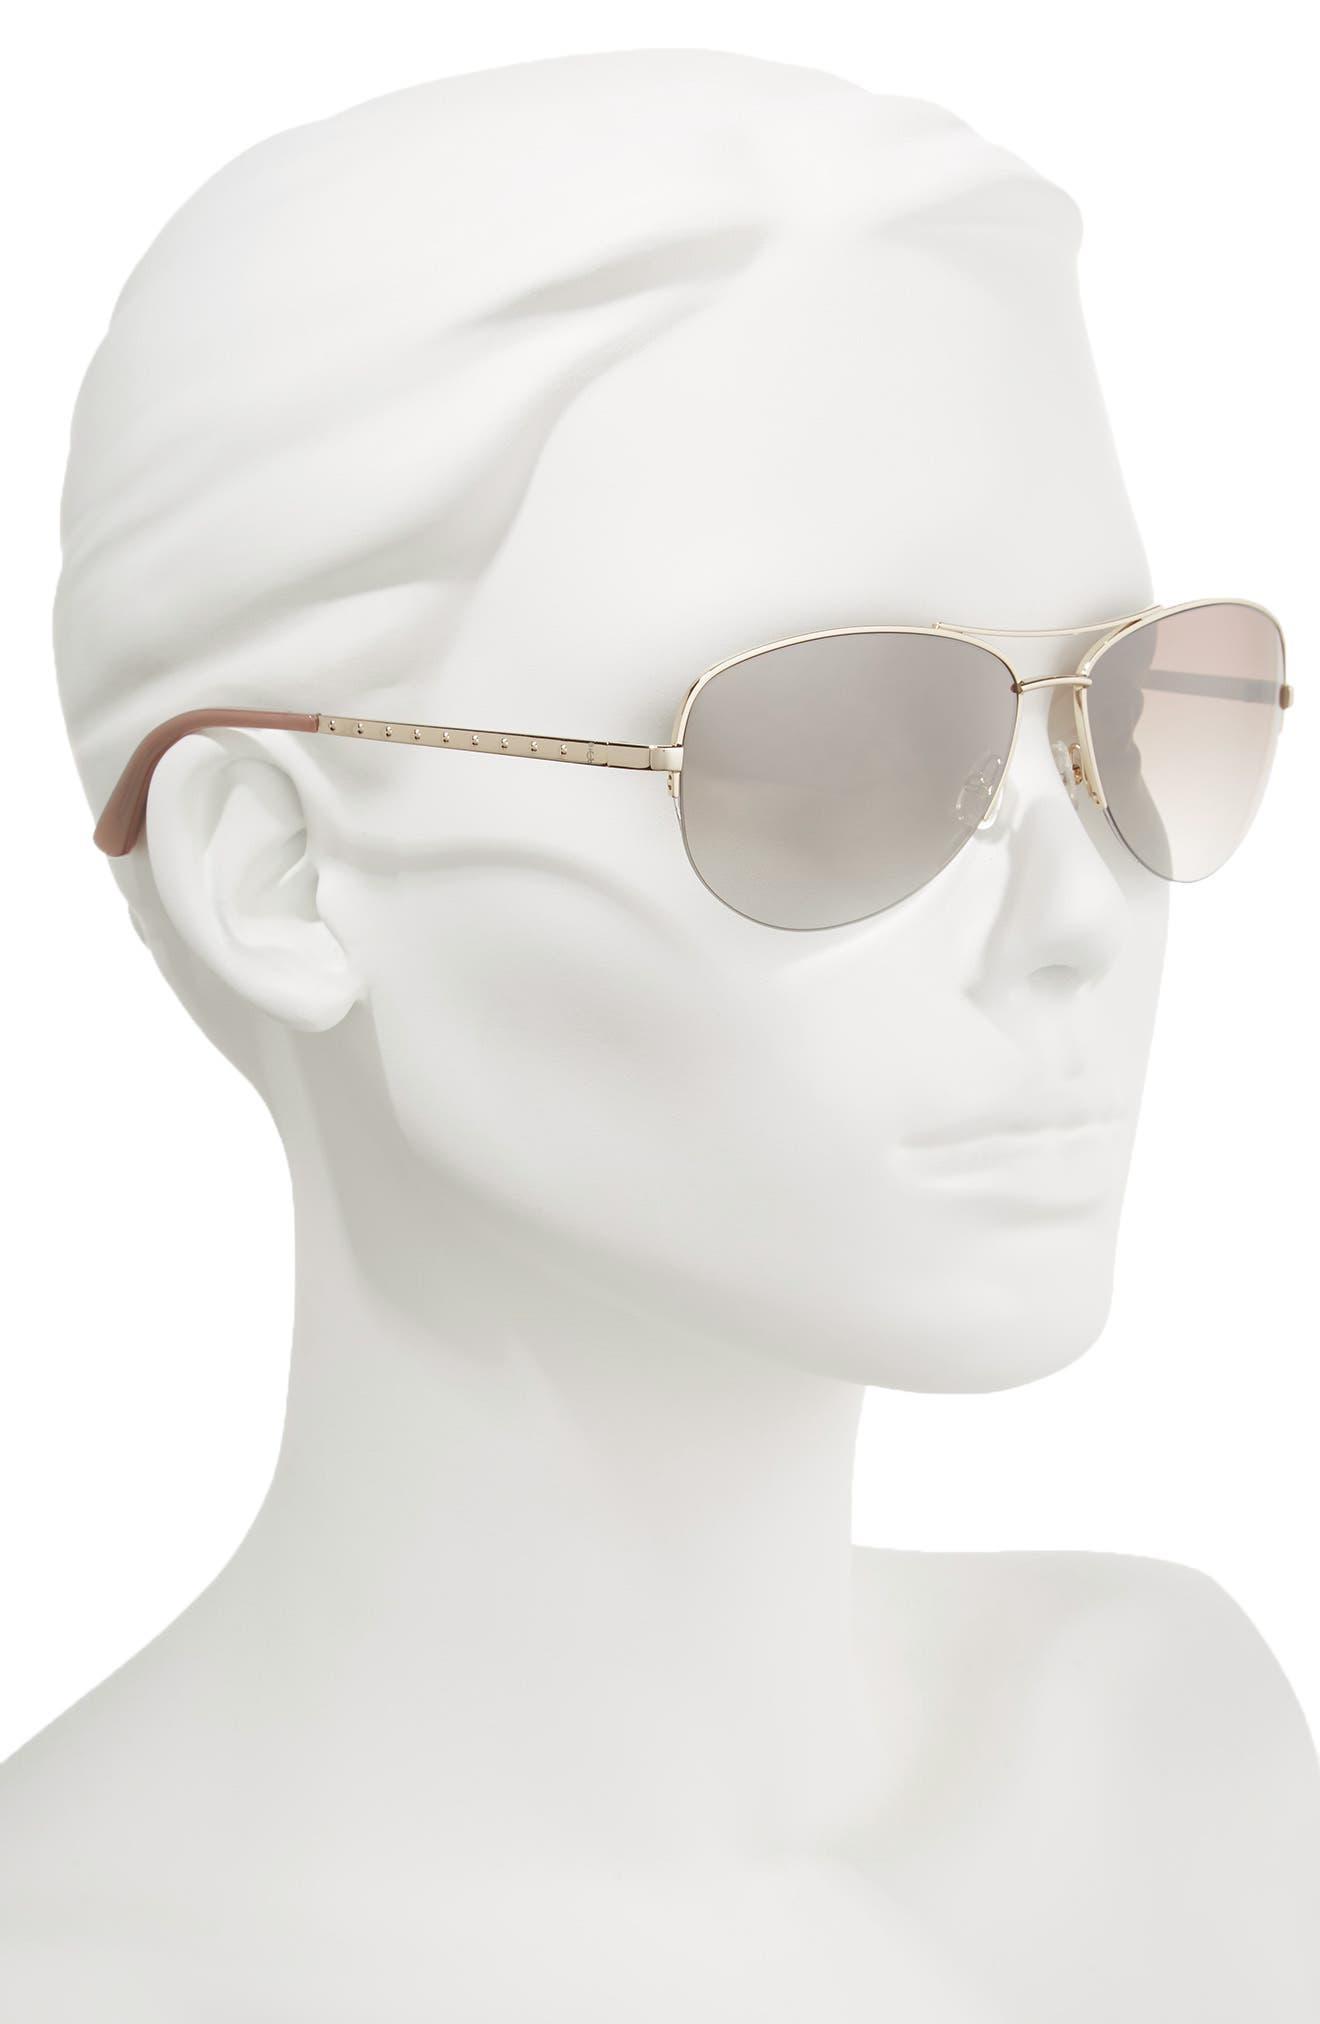 Black Label 60mm Gradient Aviator Sunglasses,                             Alternate thumbnail 2, color,                             Light Gold